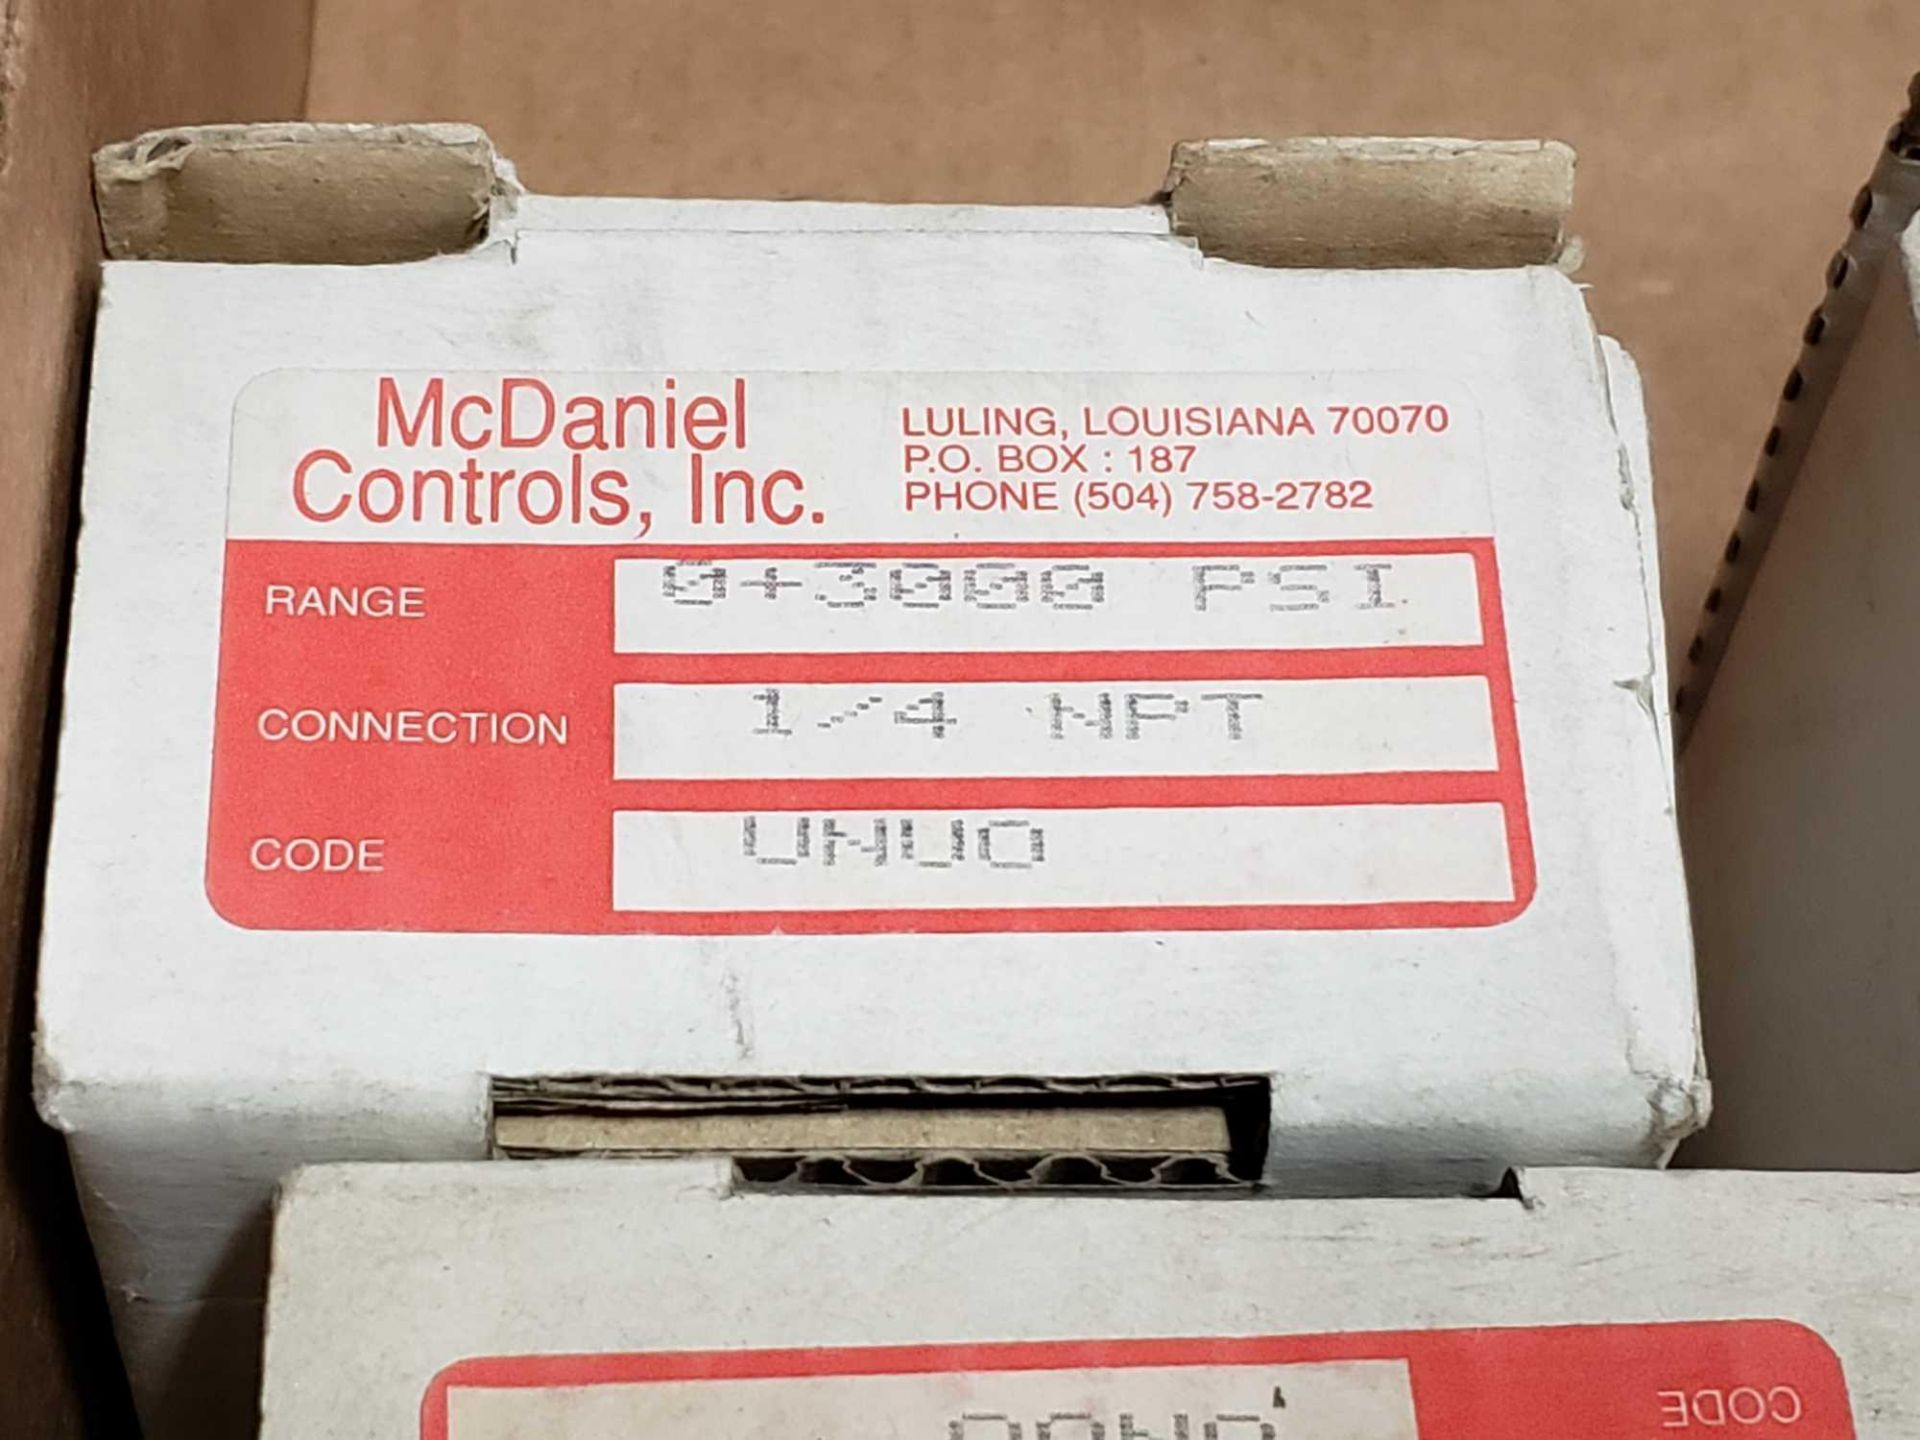 Lot 14 - Qty 10 - McDaniel Controls gauge model UNU0, 0-3000psi. New in box.